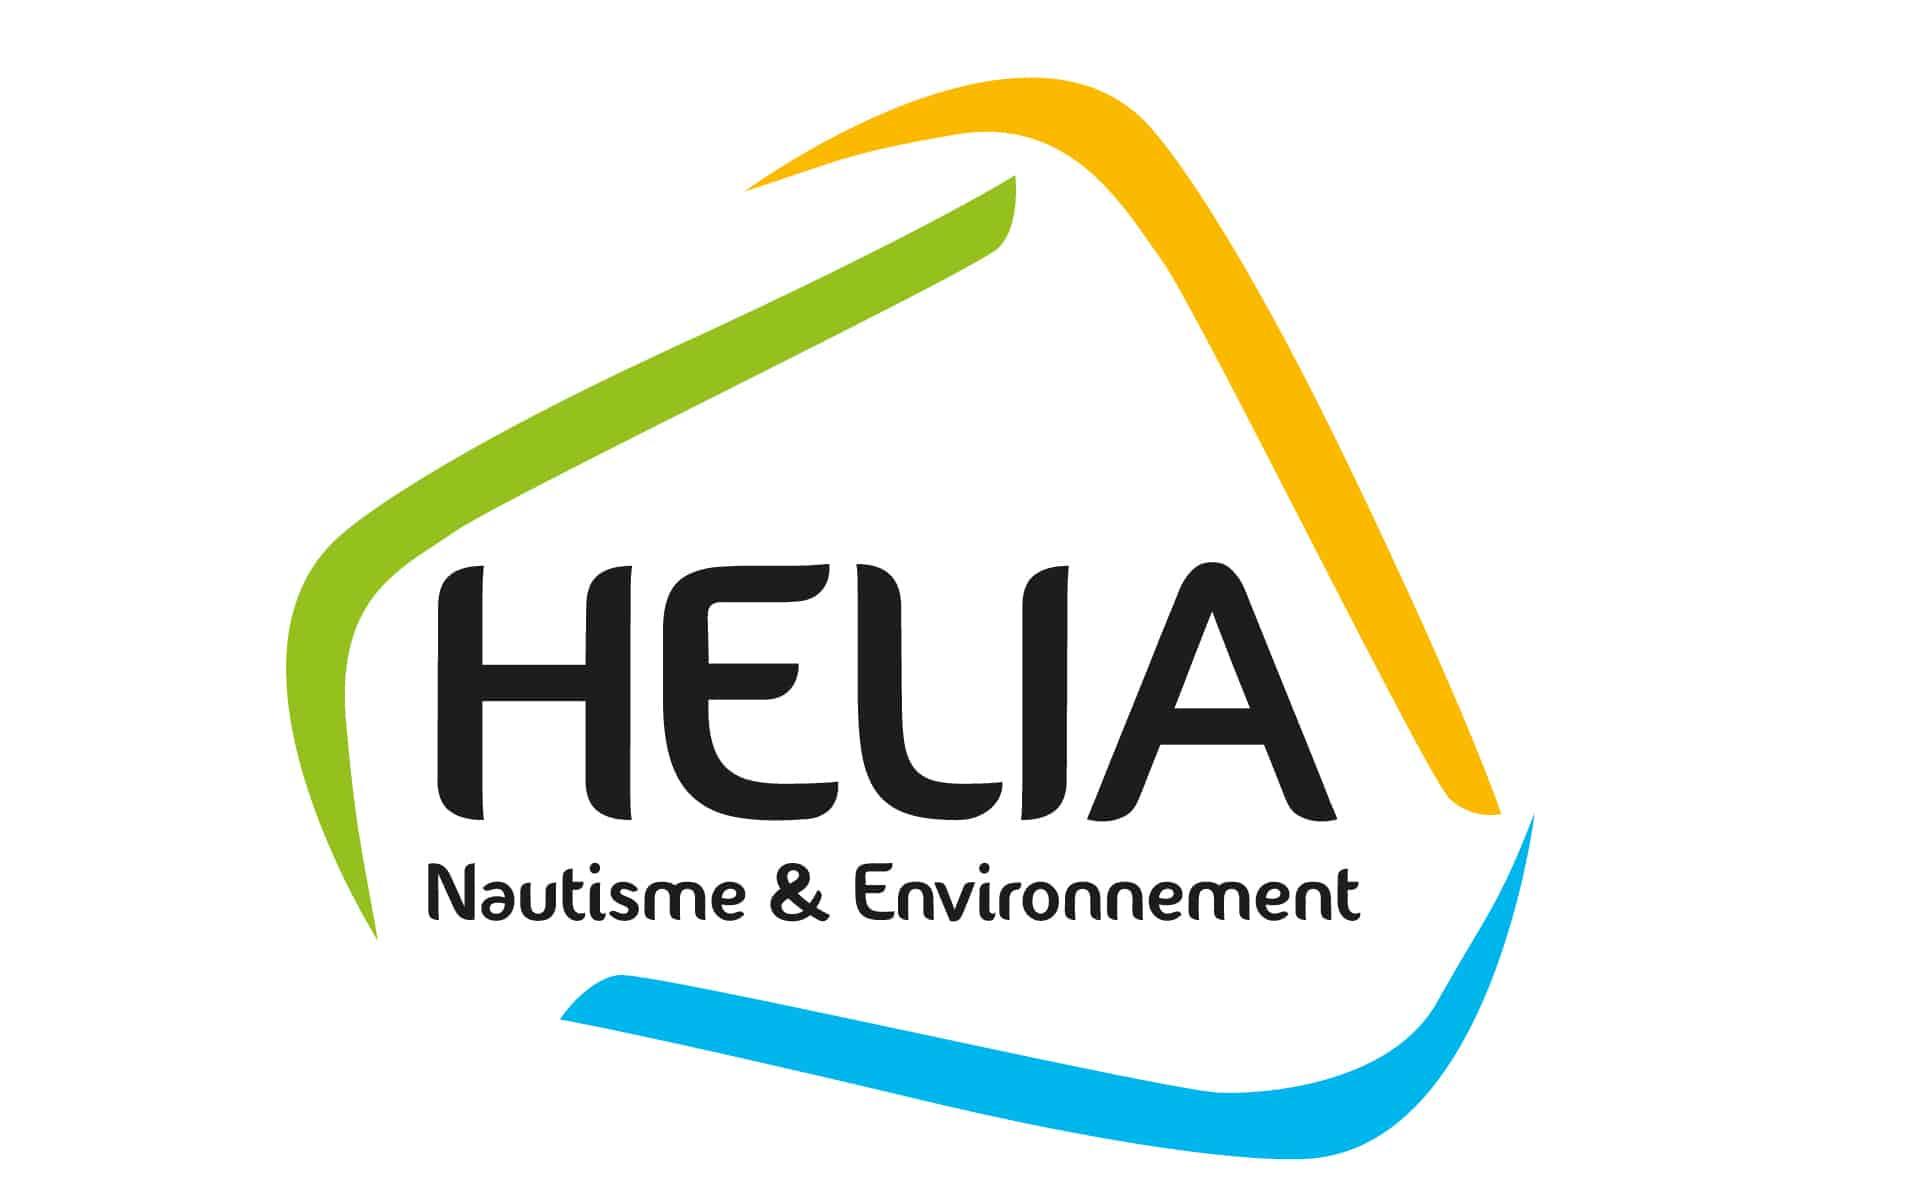 HELIA NAUTISME ENVIRONNEMENT